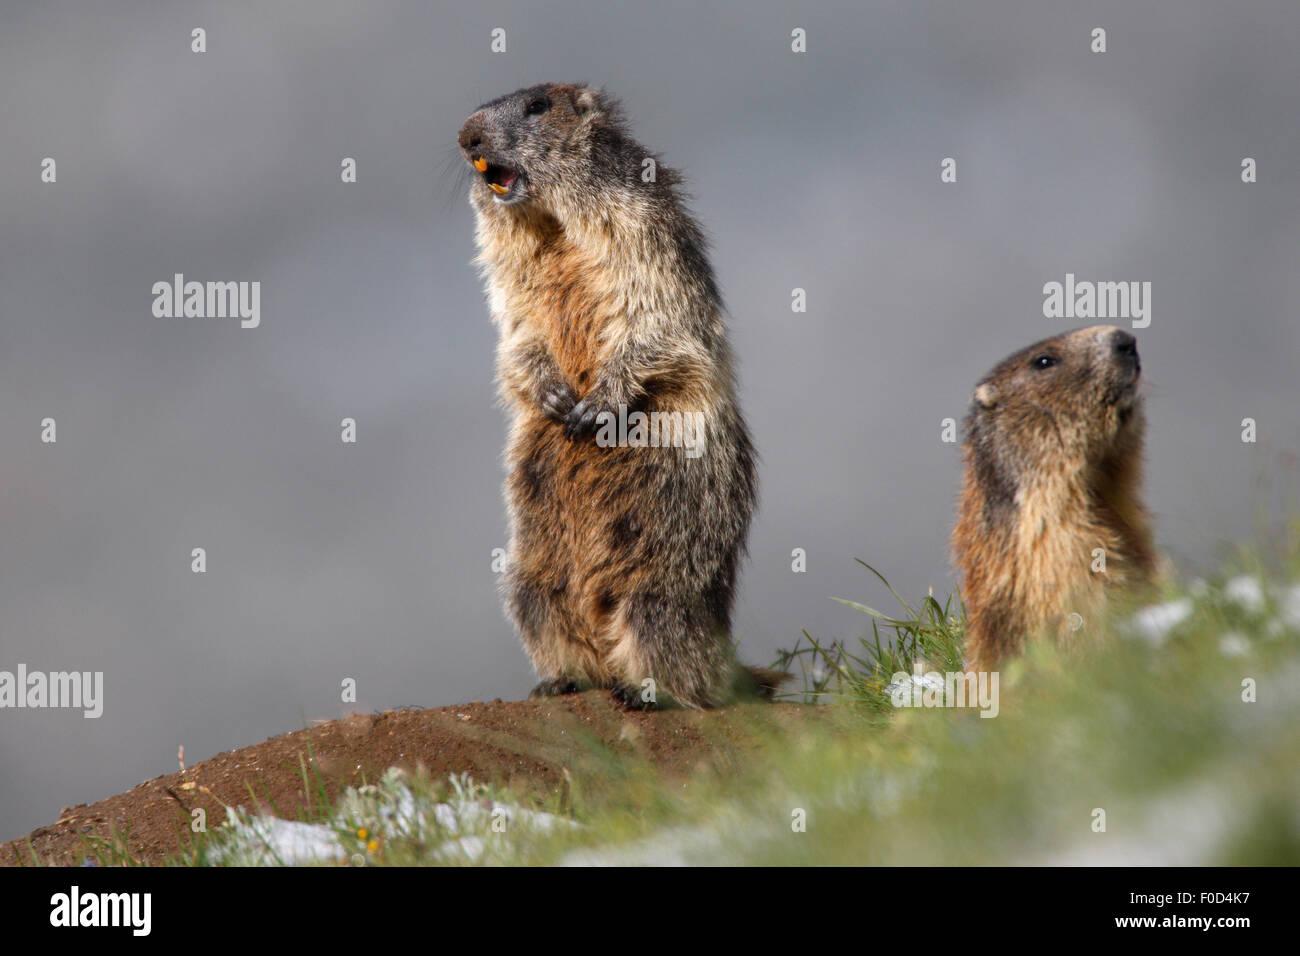 Two Alpine marmots (Marmota marmota) alert, Hohe Tauern National Park, Austria, July 2008 - Stock Image